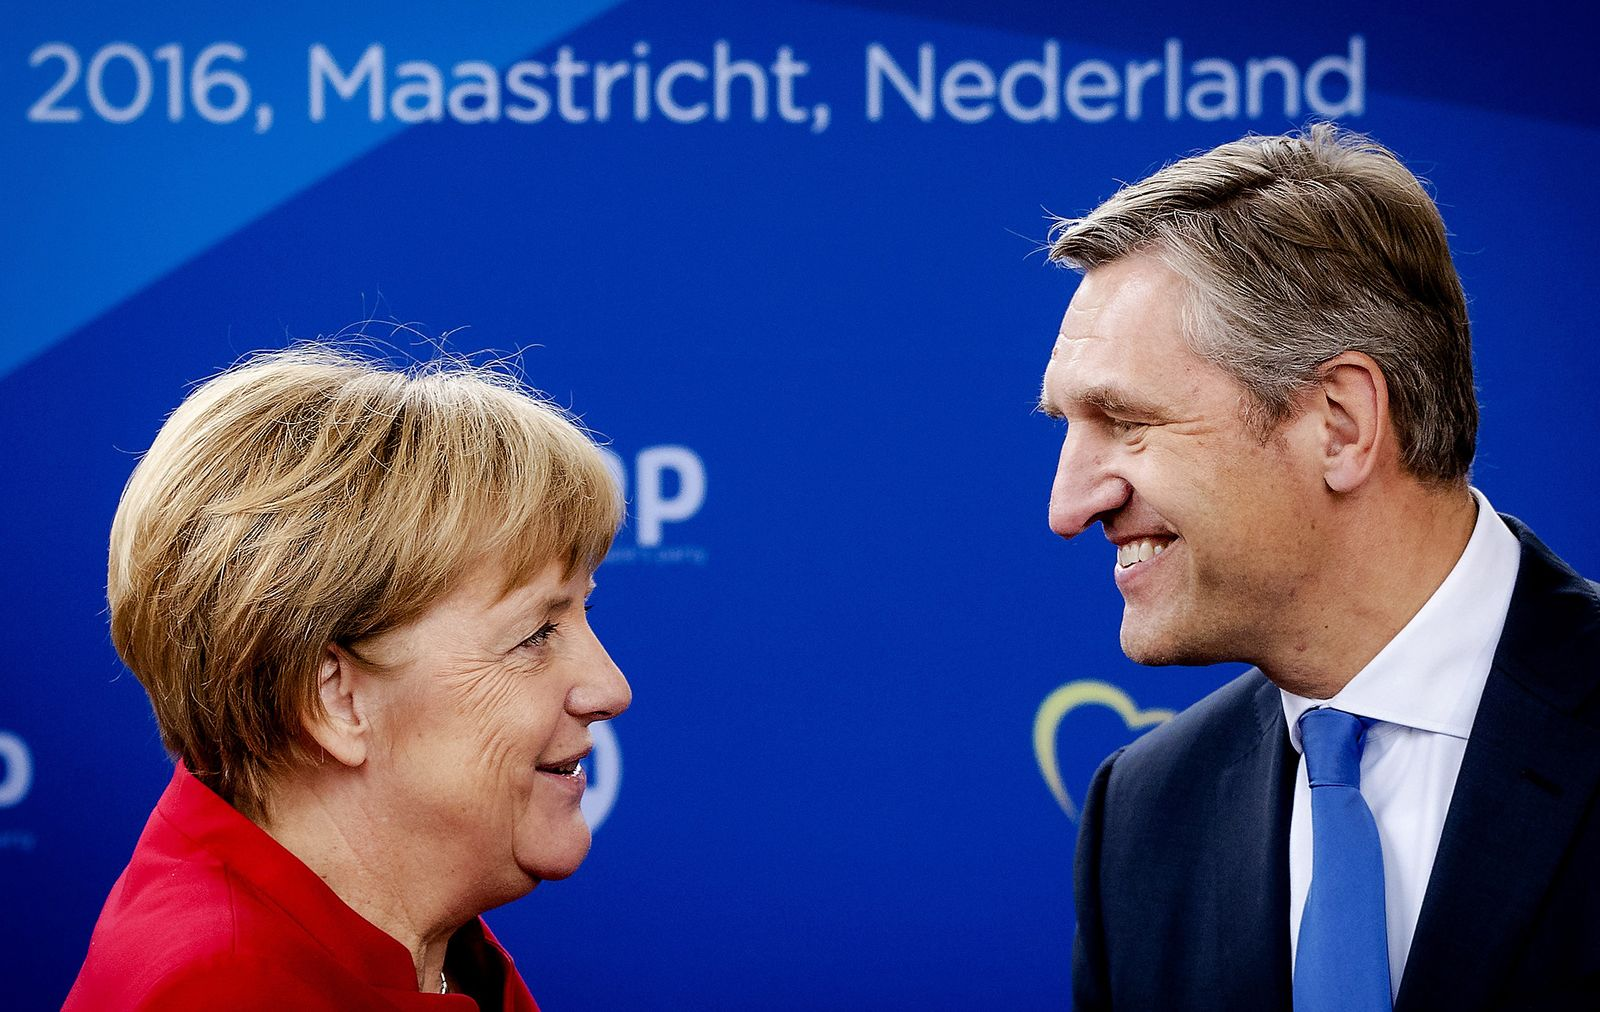 Christen Democratisch Appèl / Sybrand Buma CDA / Niederlande